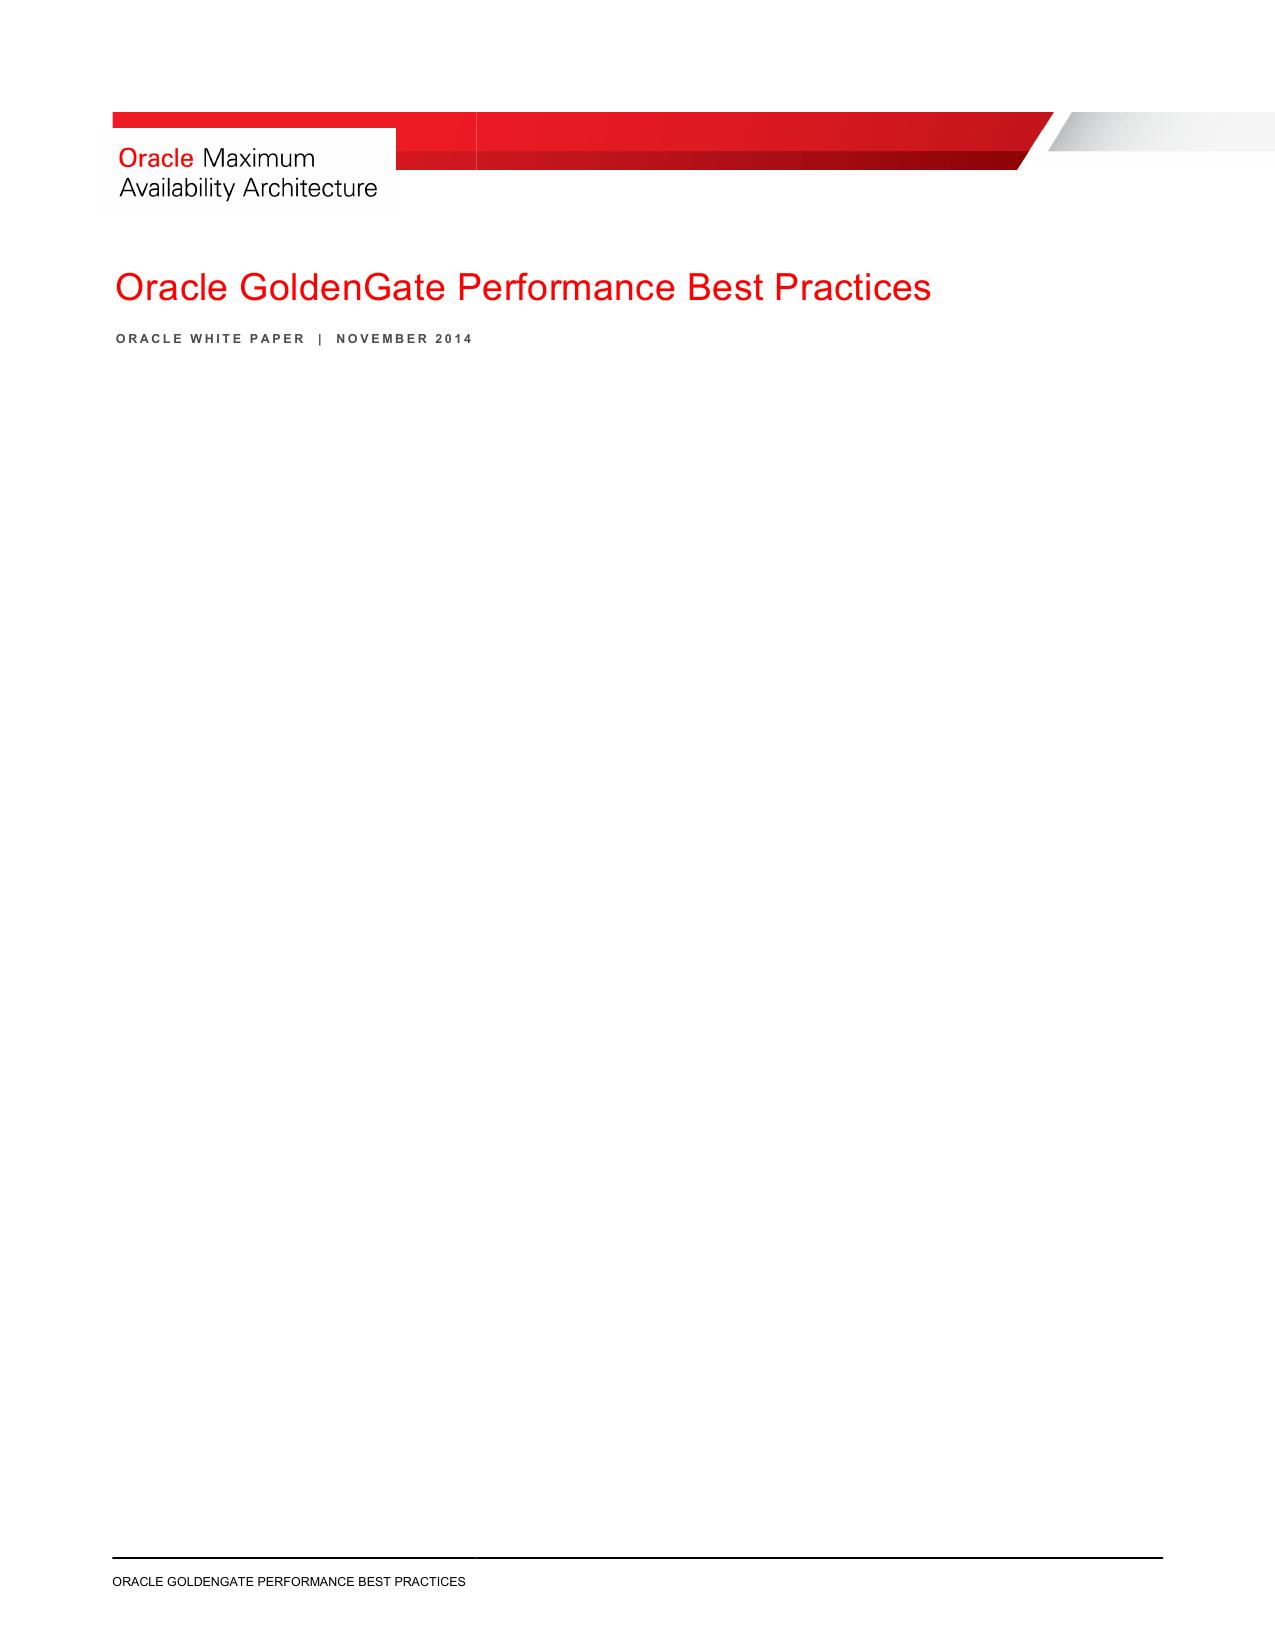 Oracle GoldenGate Performance ldenGate Performance Best